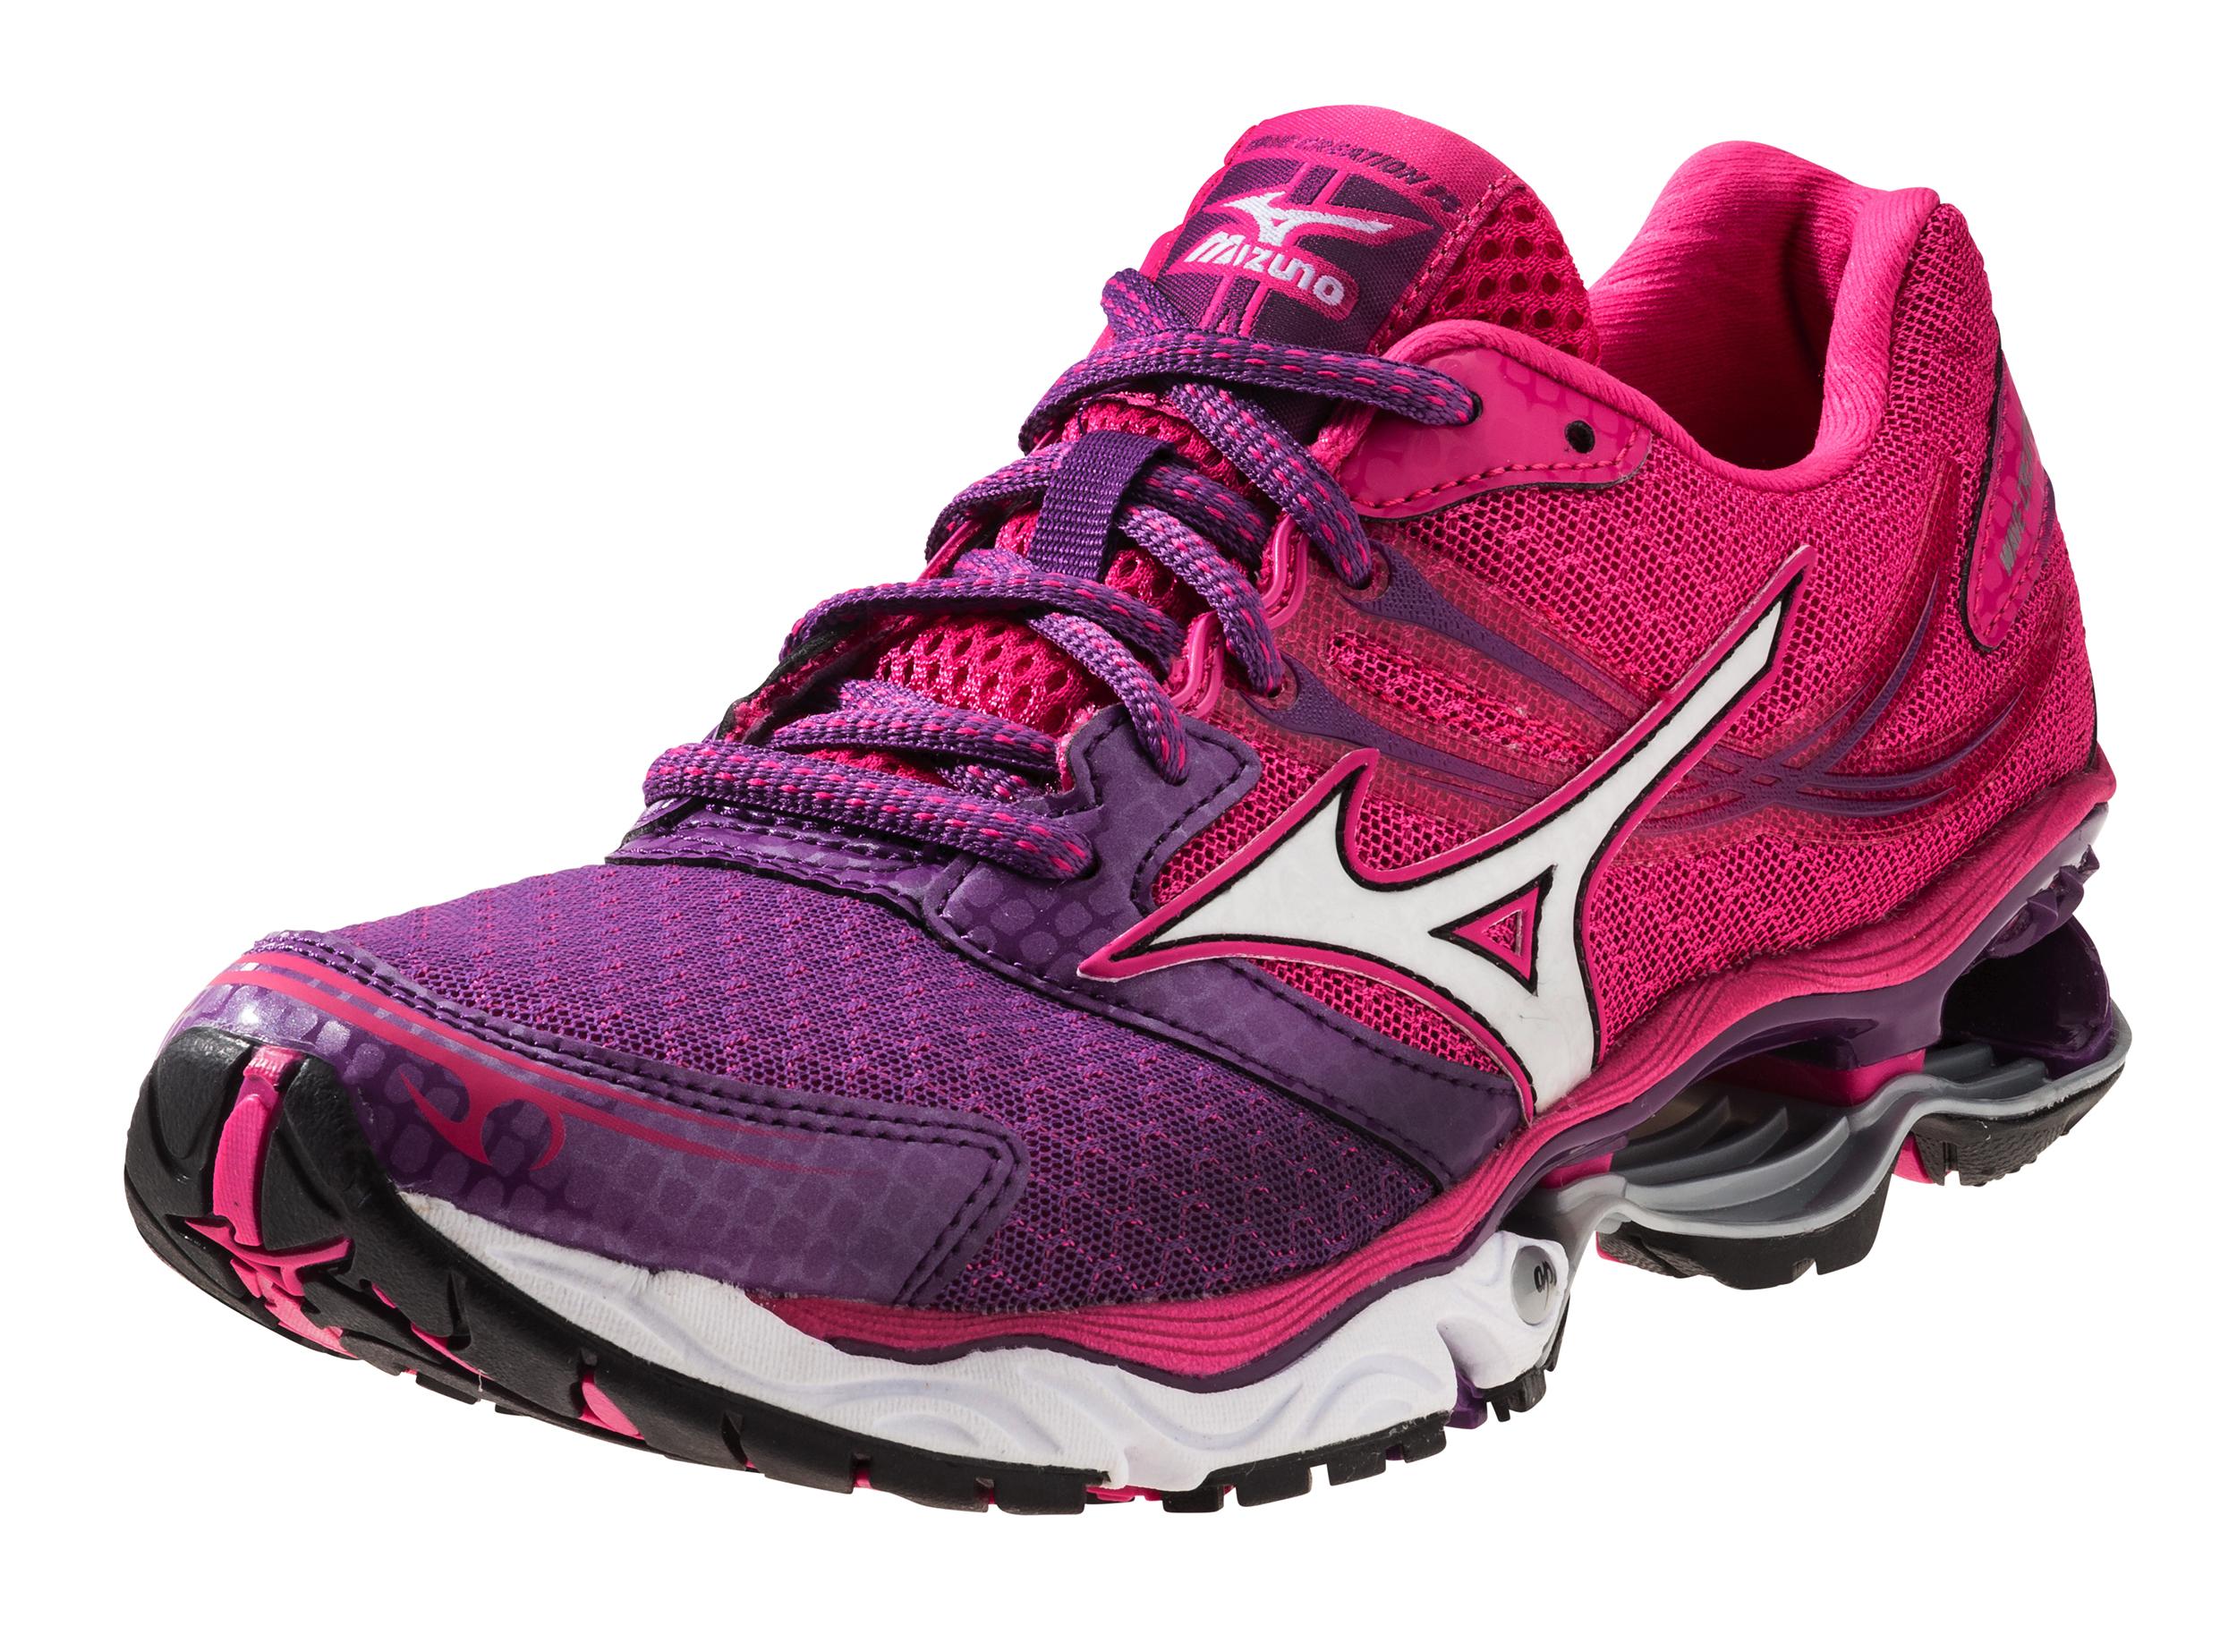 mizuno s wave creation 14 running shoes pink black